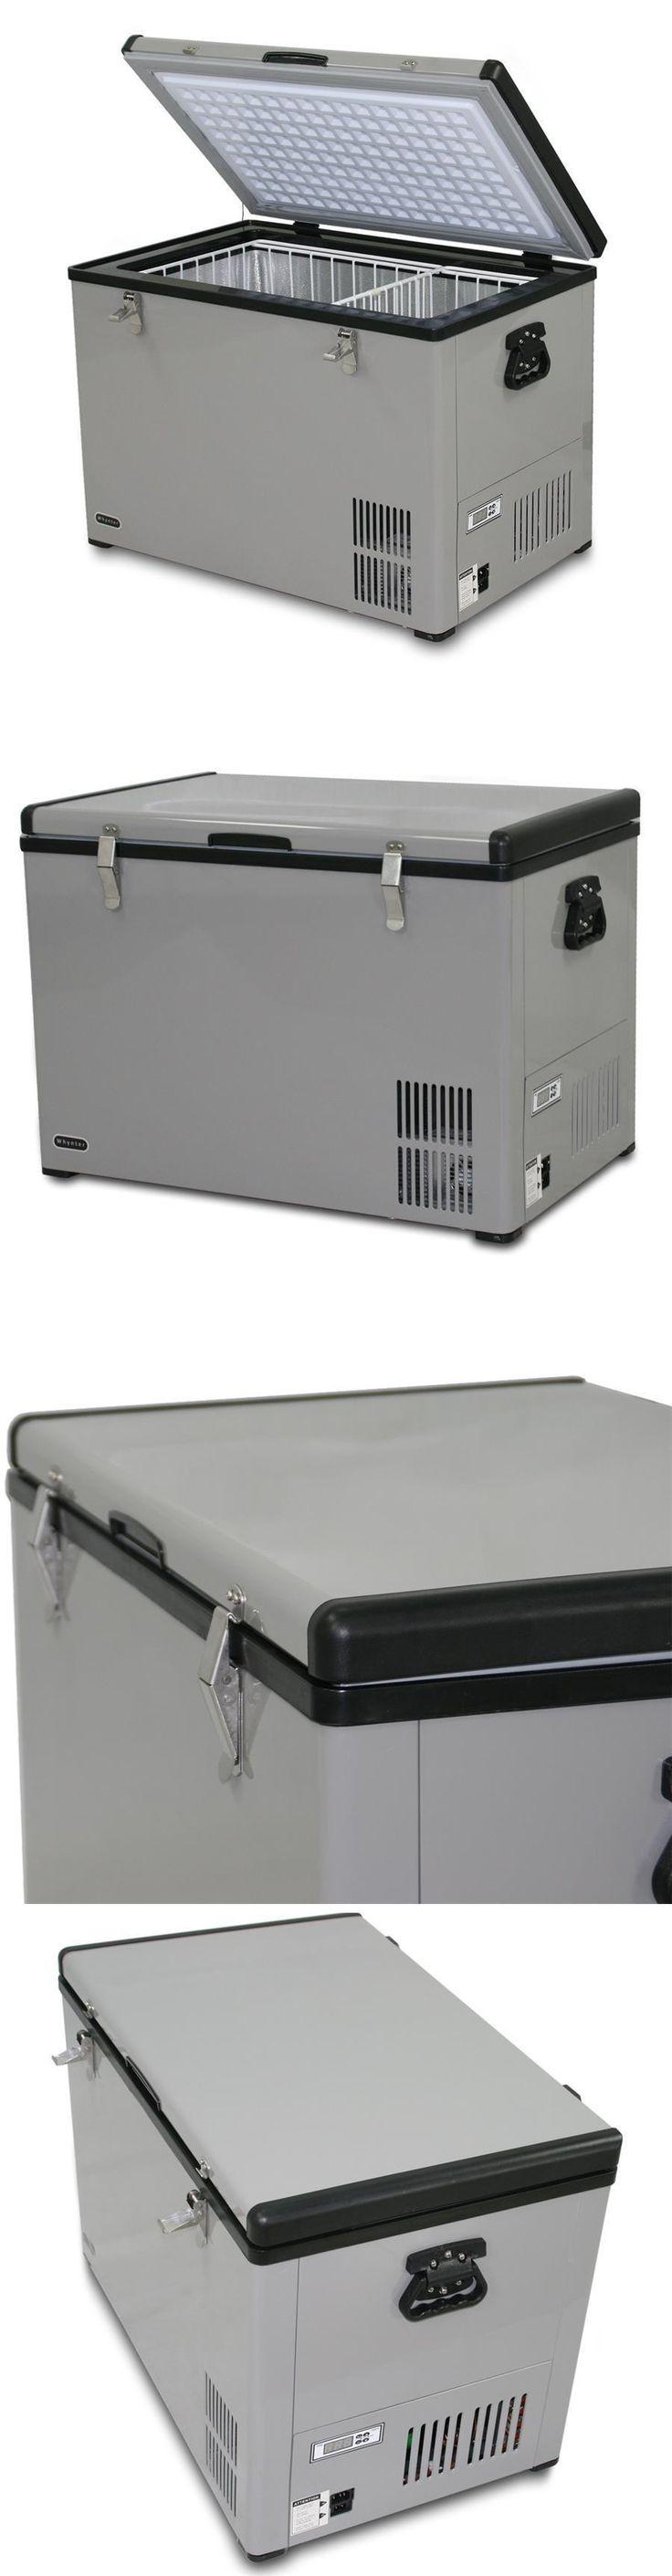 Mini Fridges 71262: New!! Whynter Fm-85G Compact Fridge Freezer 85 Qt Portable Refrigerator 12 110 -> BUY IT NOW ONLY: $499.99 on eBay!